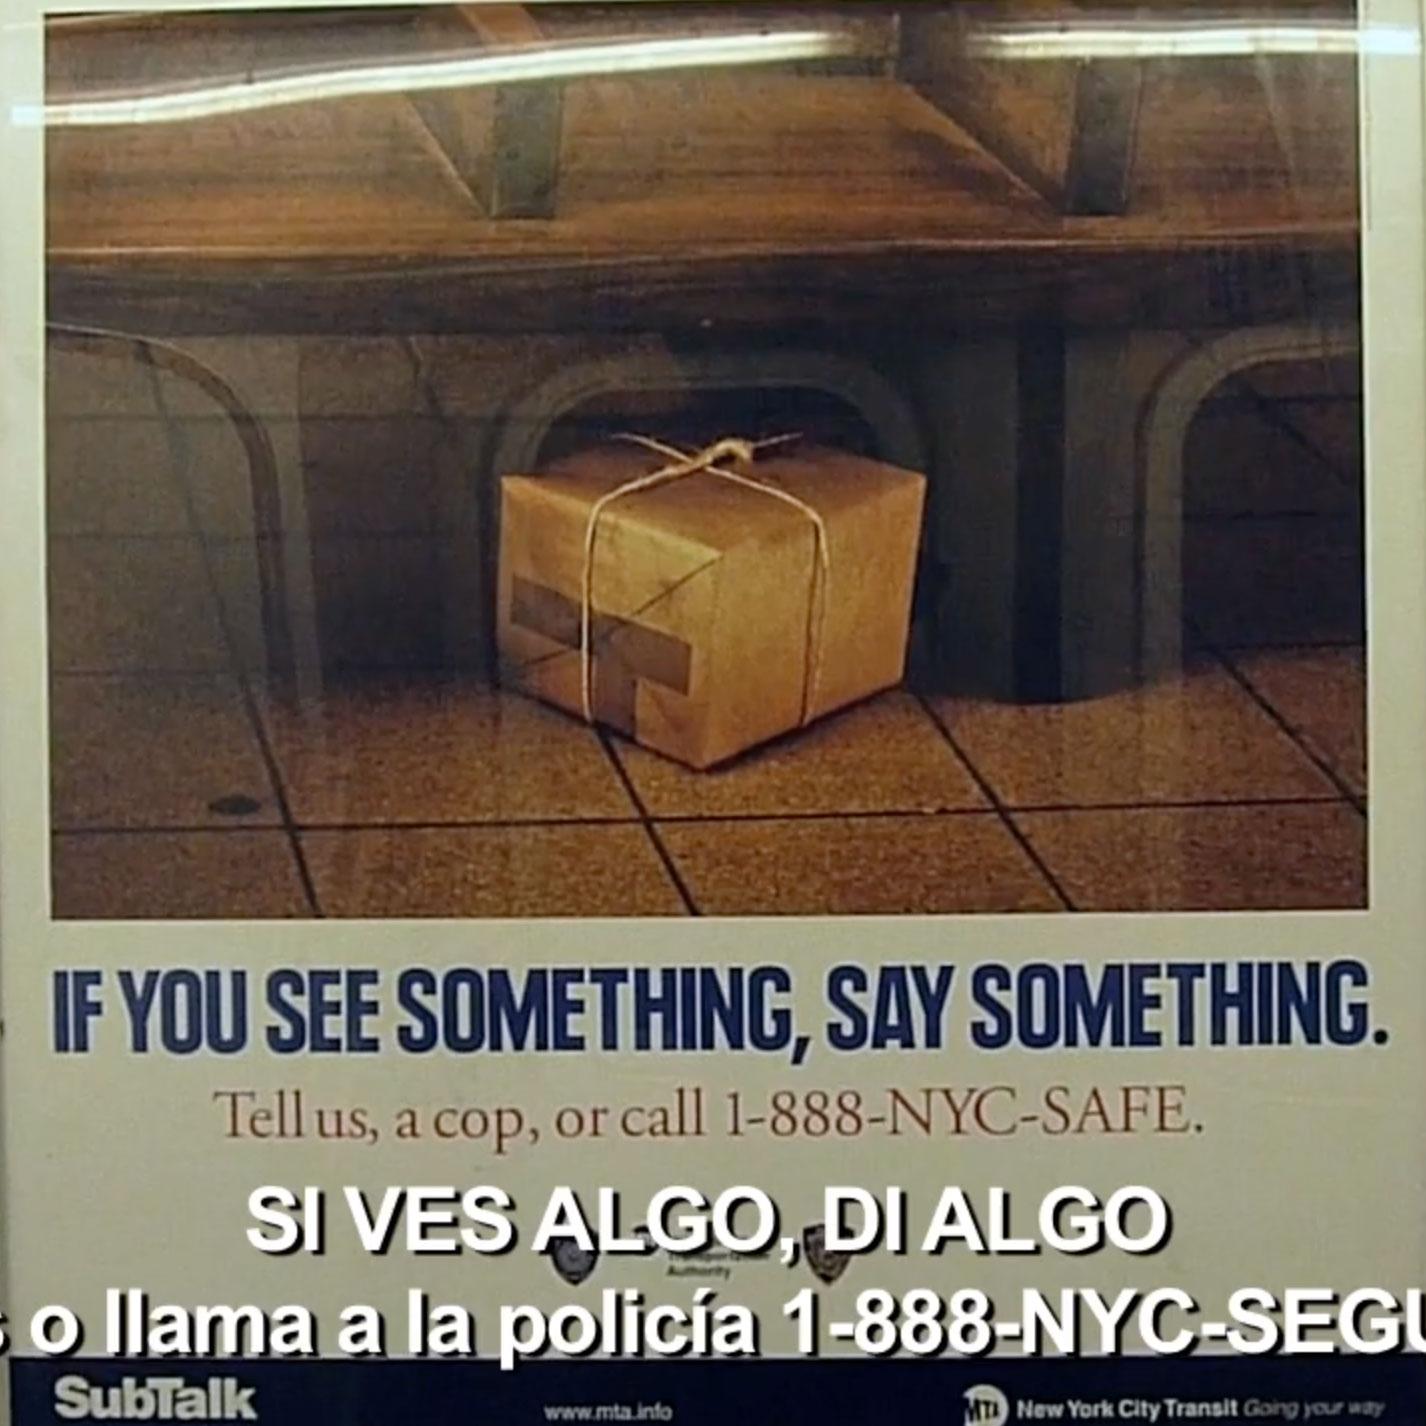 2010/ THE BOX